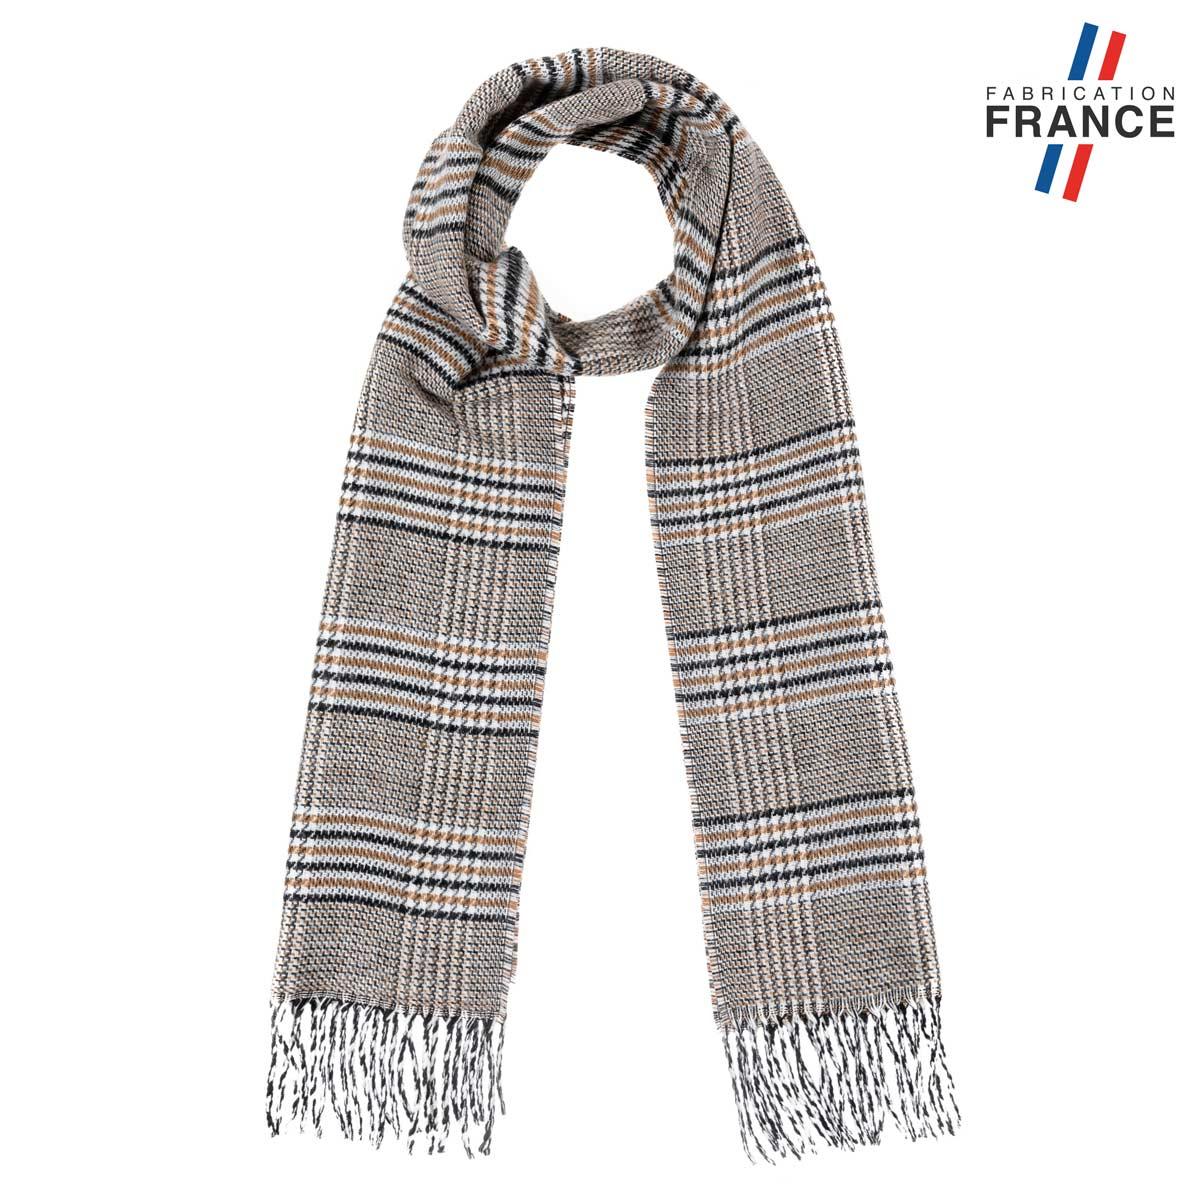 AT-06208_F12-1FR_Echarpe-femme-carreaux-fabrication-france